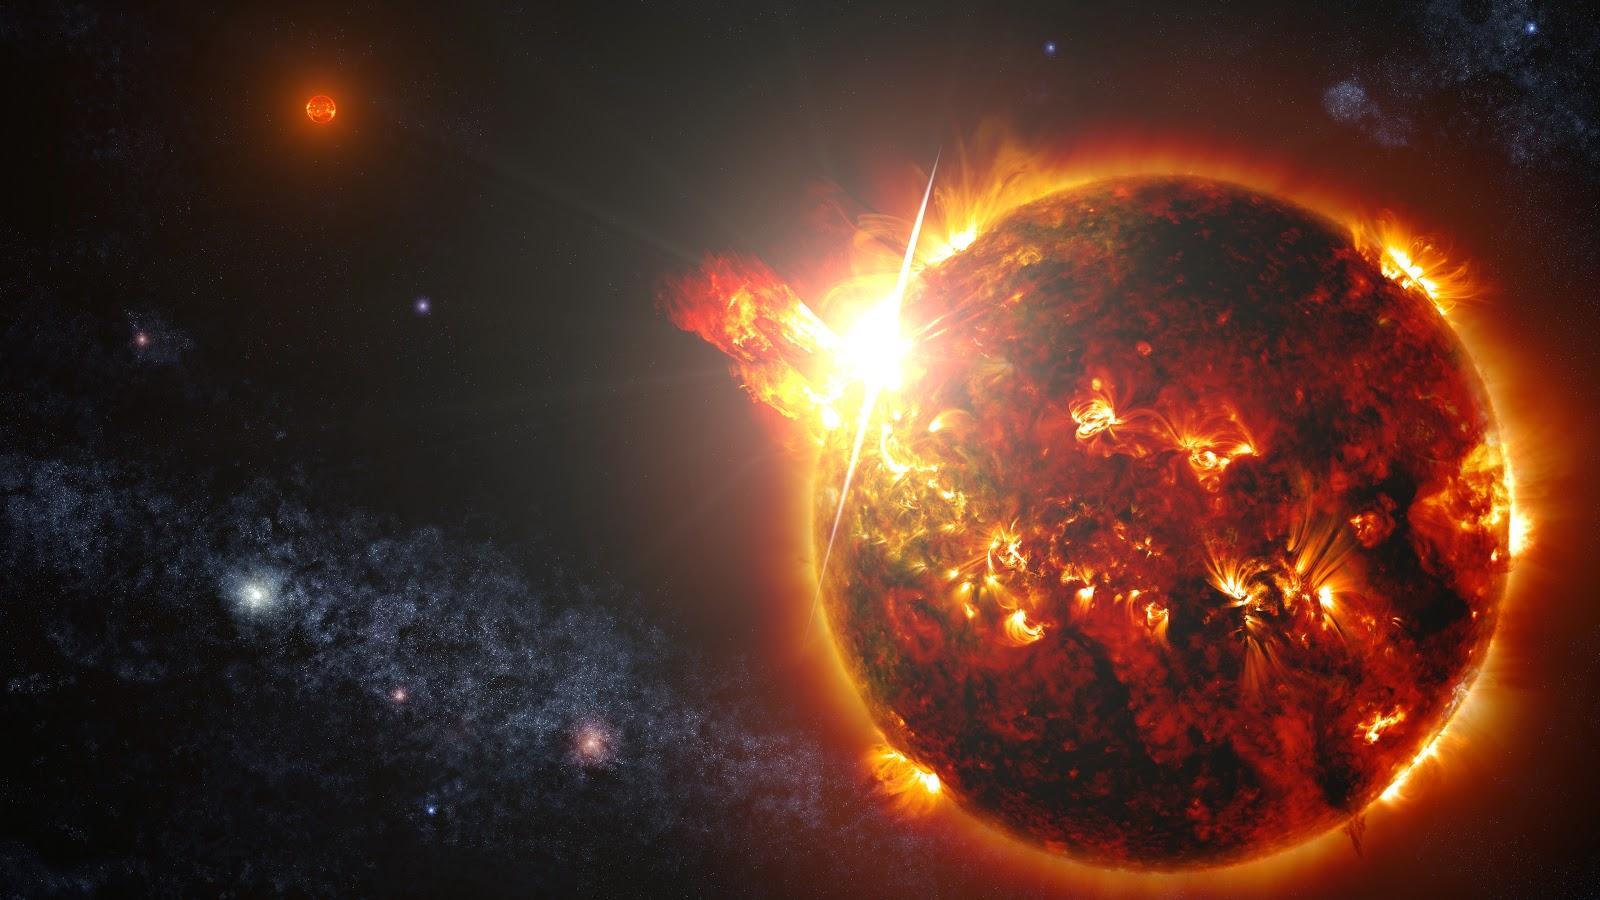 Mega-έκλαμψη σε γειτονικό άστρο